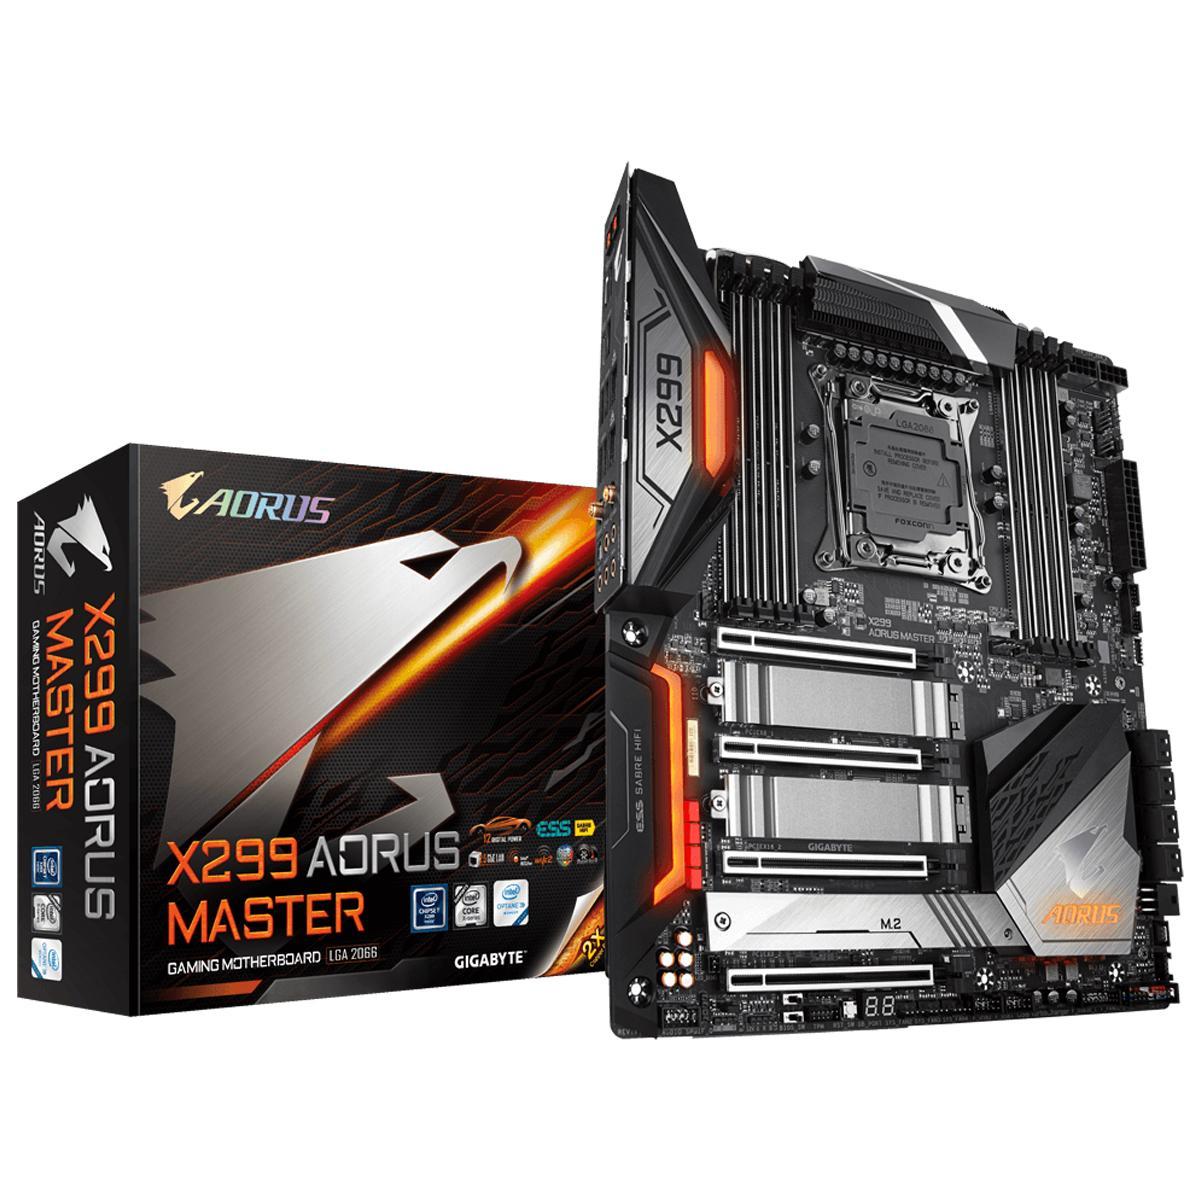 Gigabyte X299 Aorus Master EATX LGA 2066